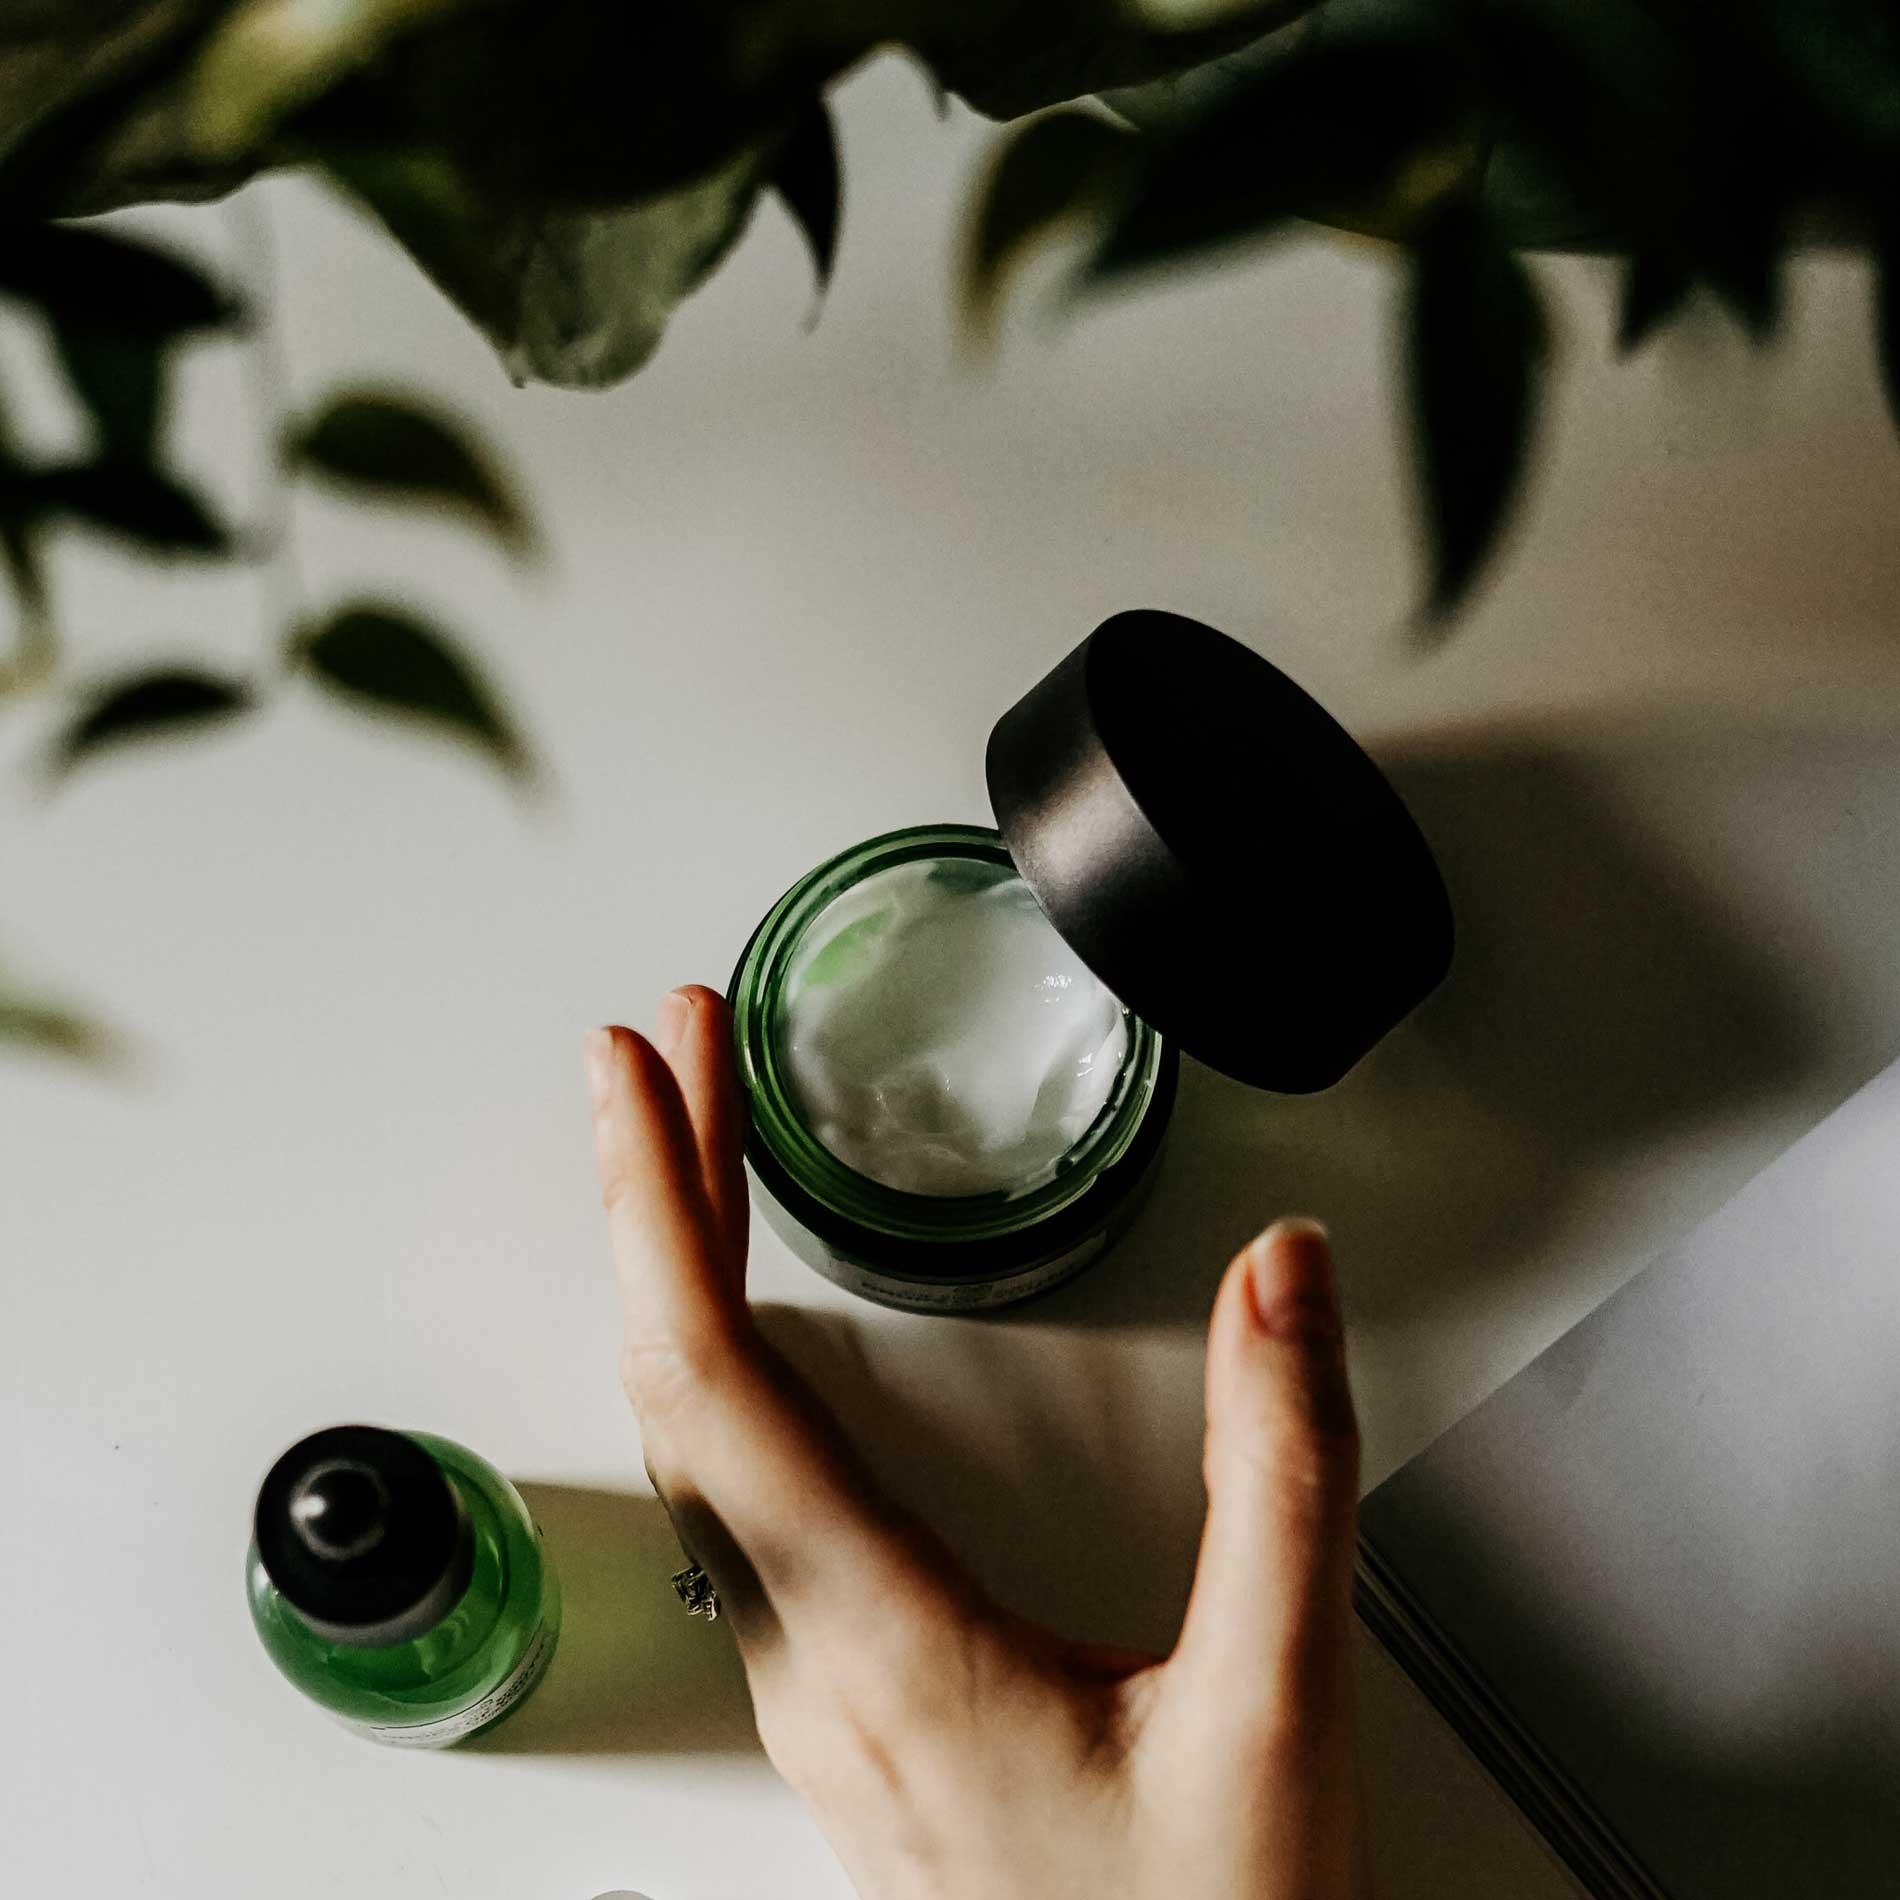 Peelings, Peeling, Gesichtspeeling, Peeling für das Gesicht, Naturkosmetik, Beauty Tipps, Wohlbefinden, Hautpflege, Gesichtspflege, Gesichtspflege mit Peeling,